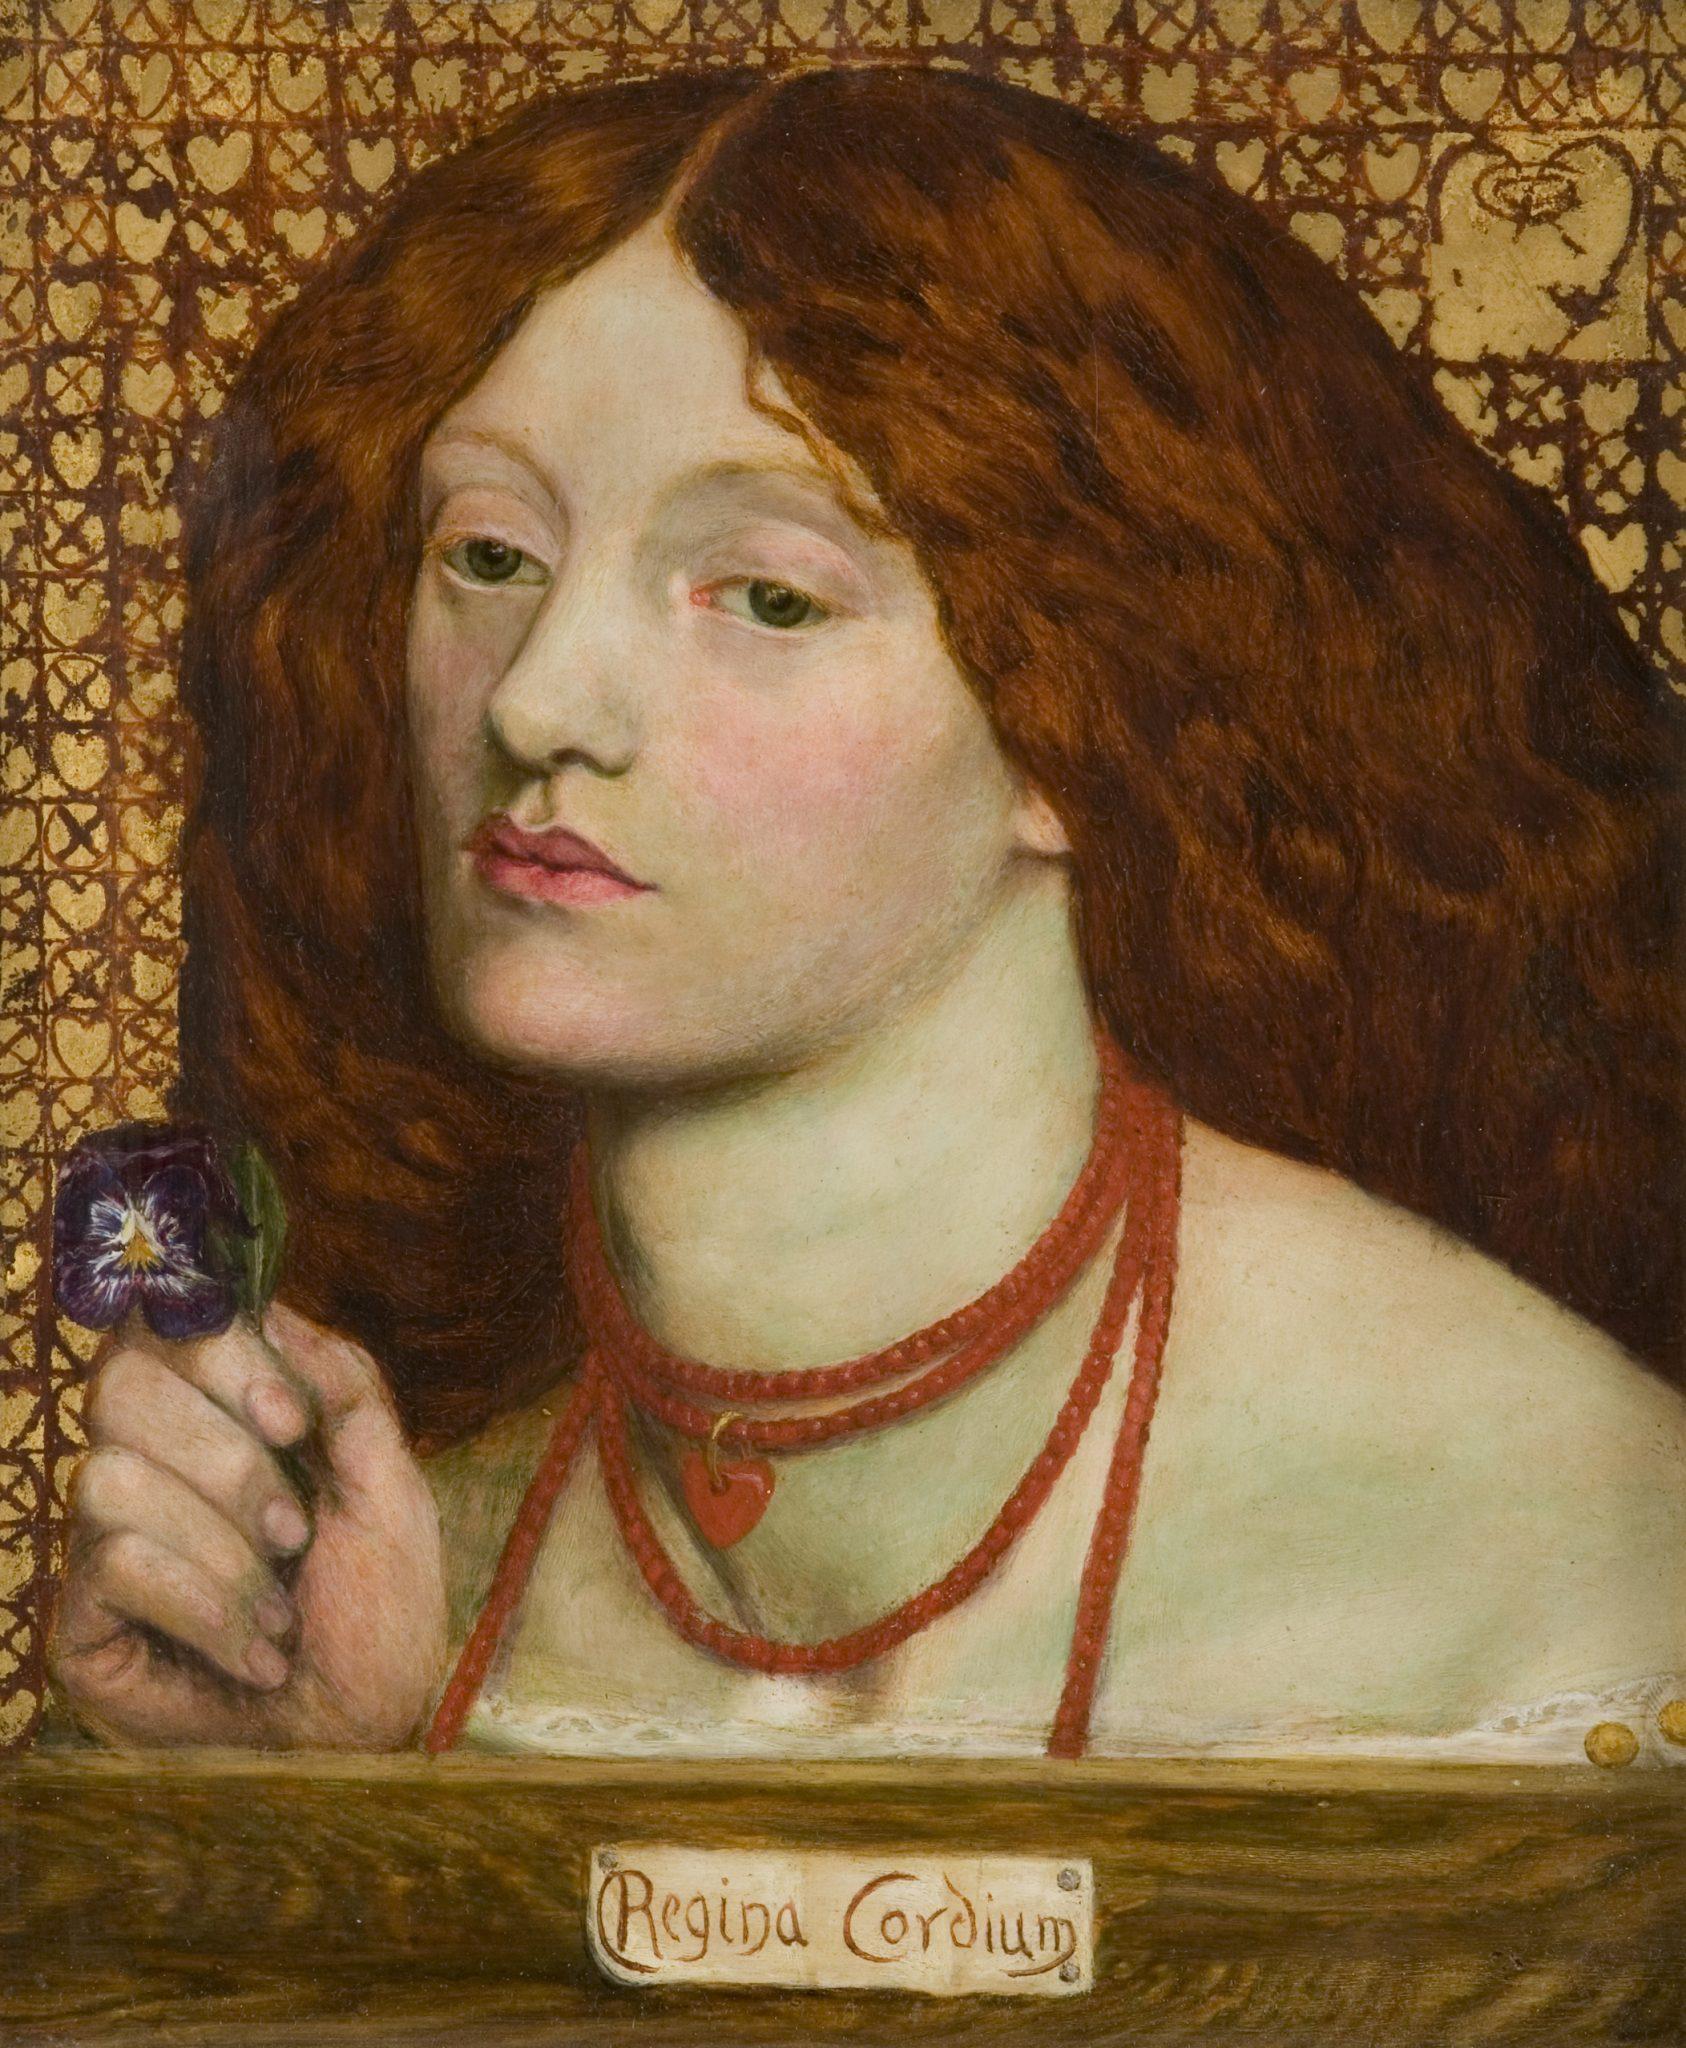 Dante Gabriel Rossetti Regina Cordium, 1860 Olio su tela, cm 25,4 x 20,3 Johannesburg Art Gallery, Johannesburg